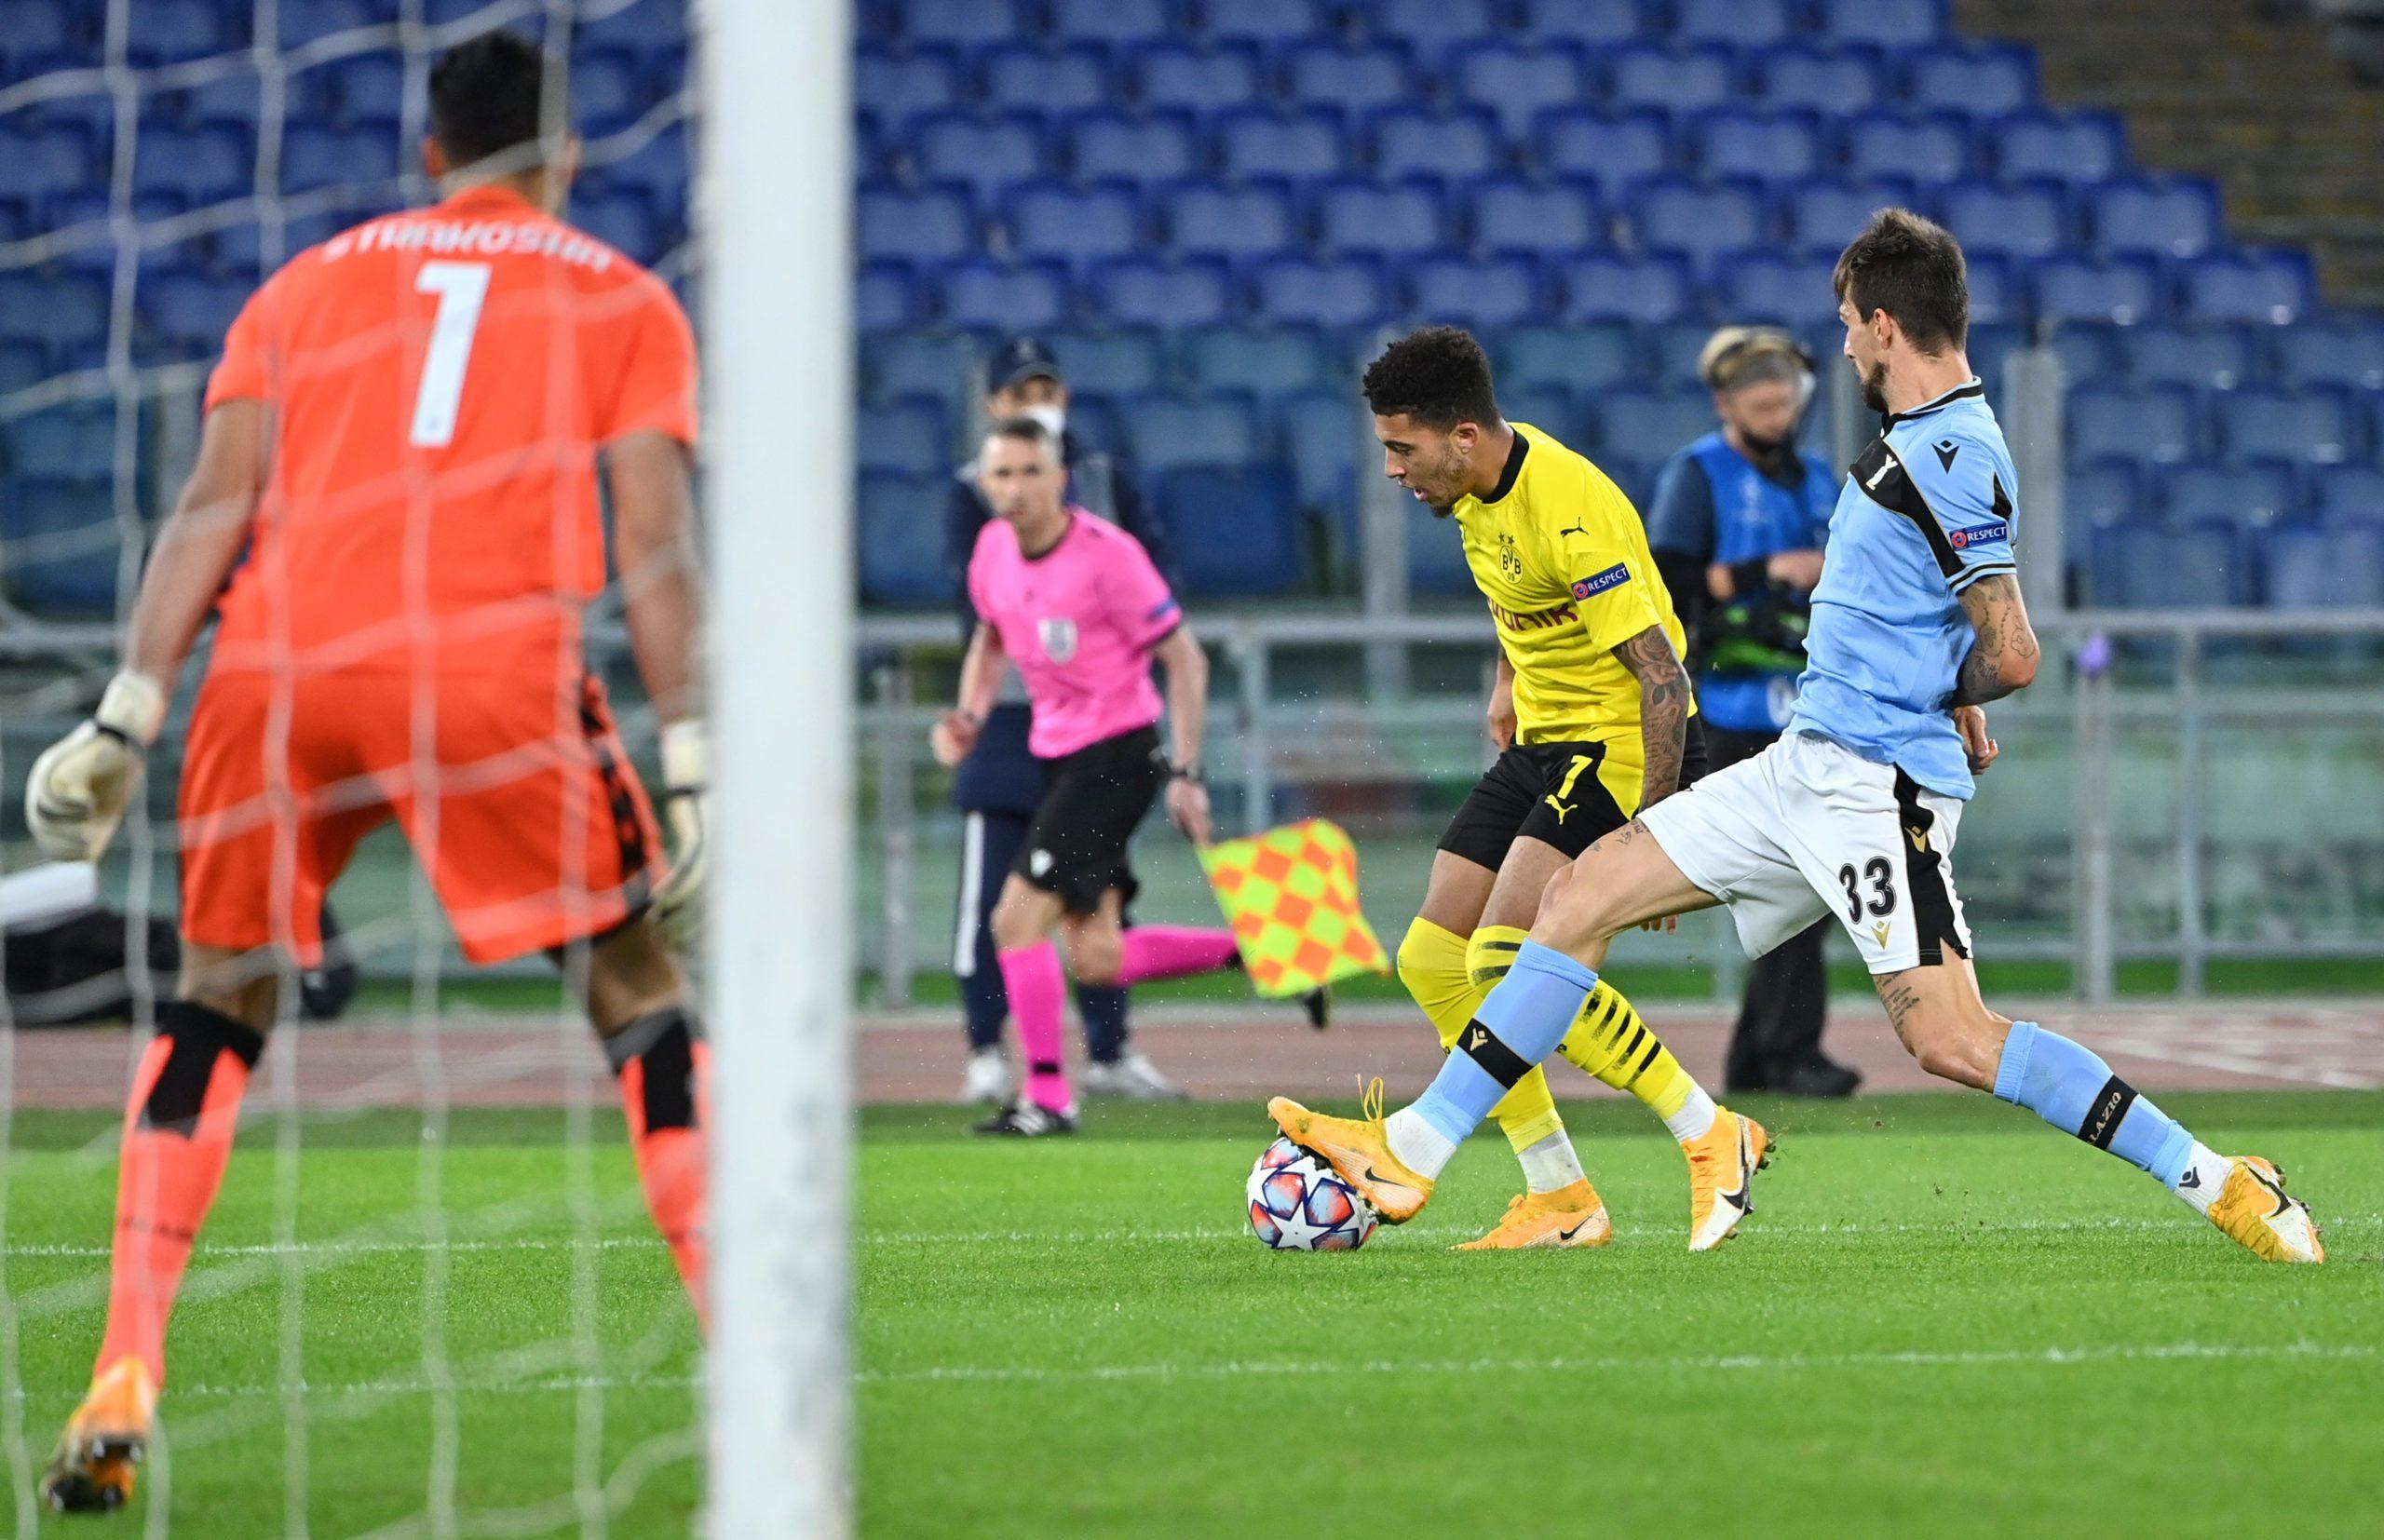 Bundesliga Lazio Vs Borussia Dortmund UEFA Champions League CONFIRMED Line ups Match Stats And LIVE Blog